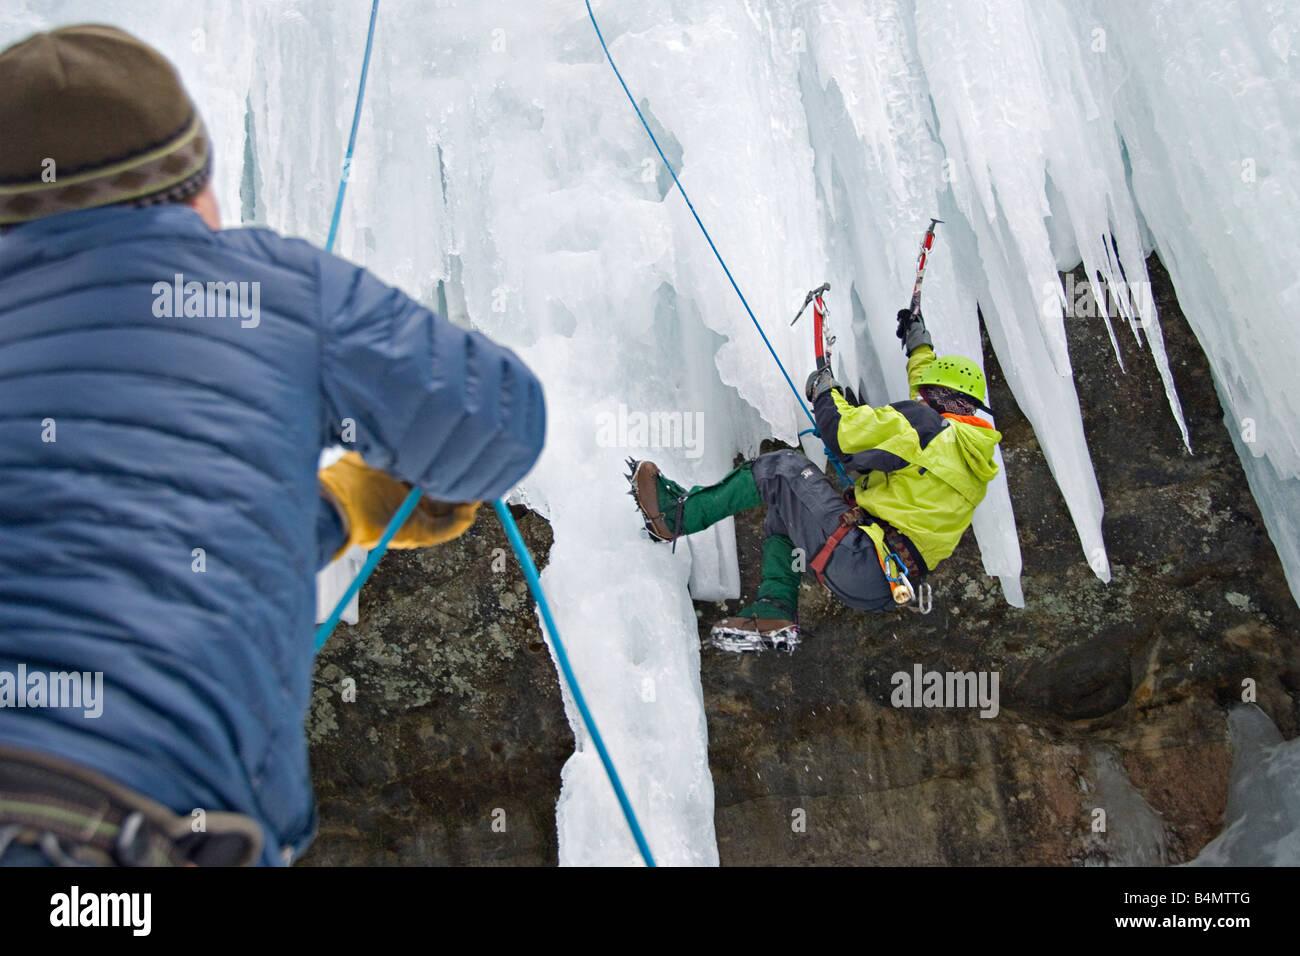 Ice climbing during Michigan Ice Fest at Pictured Rocks National Lakeshore in Munising Michigan Upper Peninsula - Stock Image